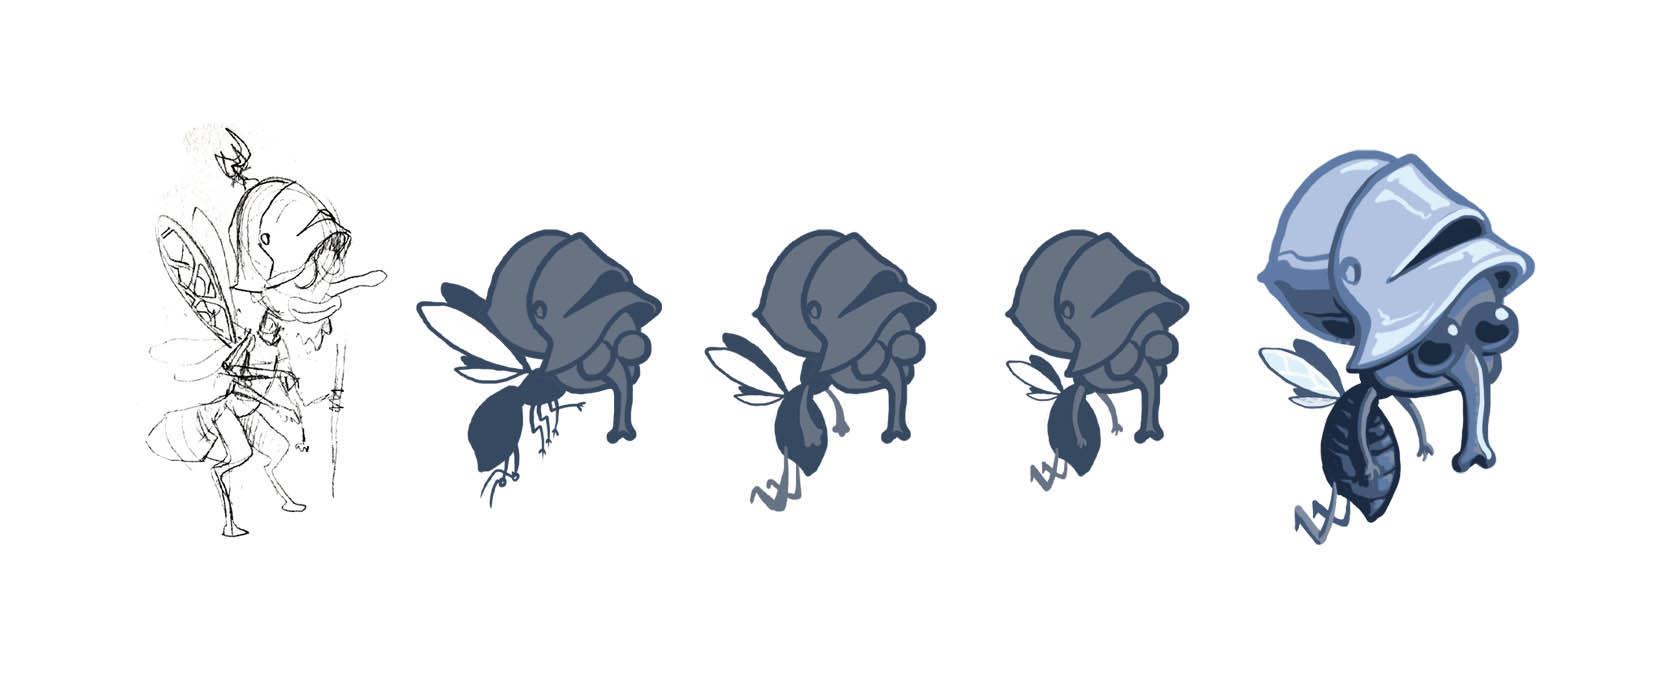 abys-illustration da-lyon rough caracter design